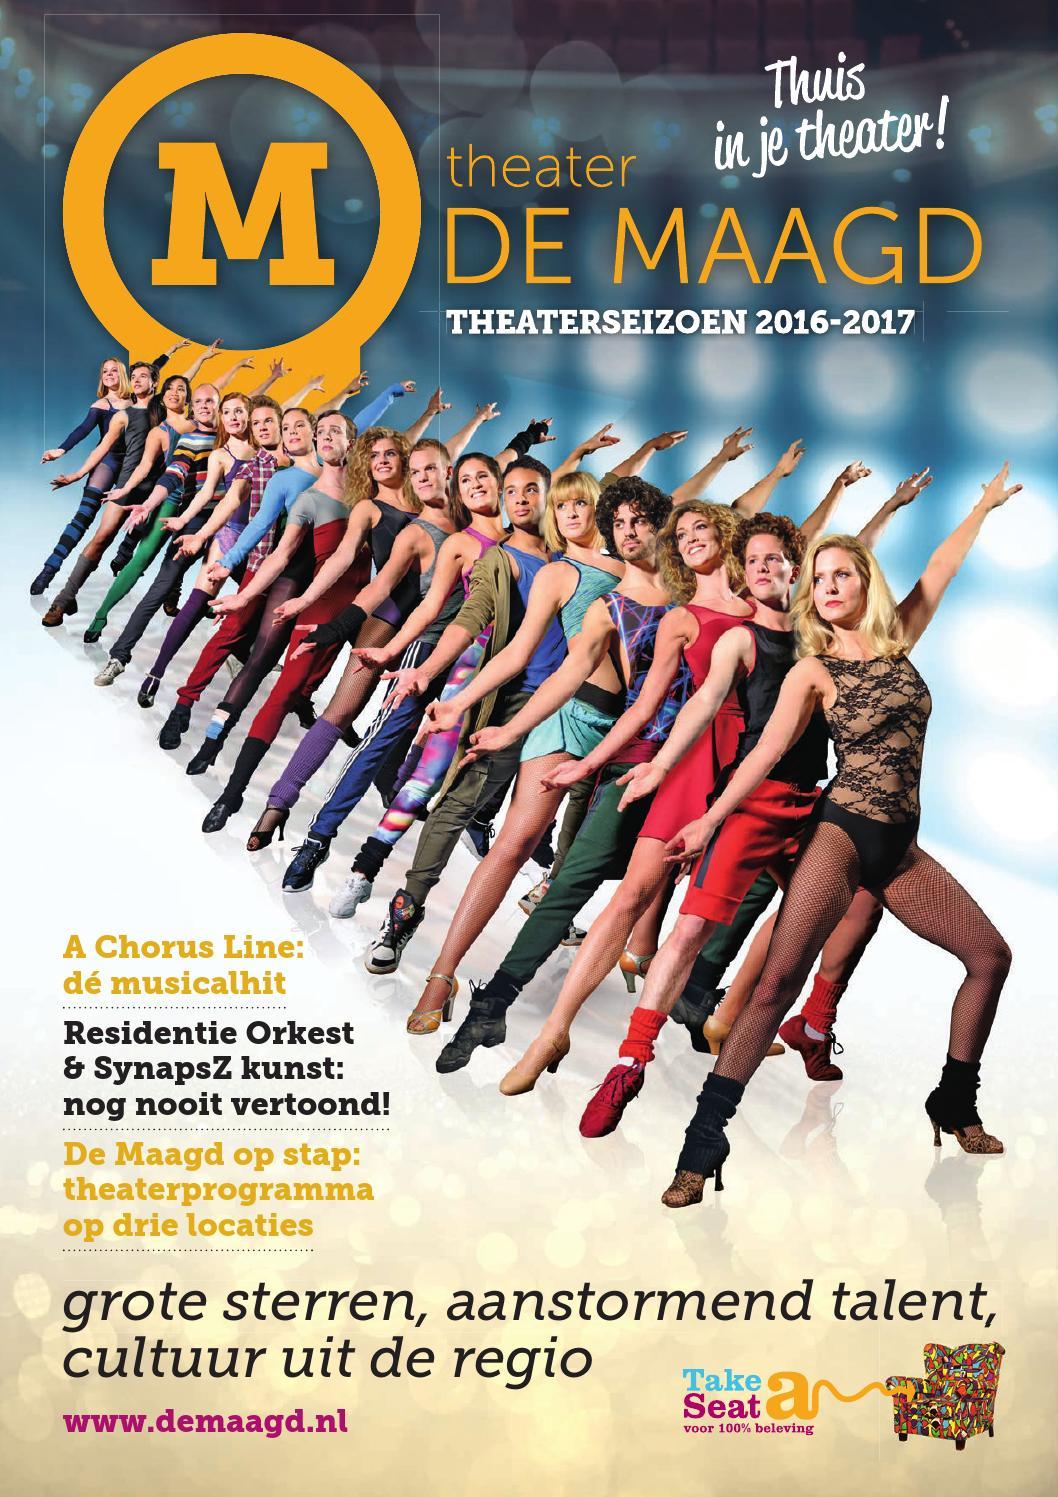 Maagdmagazine 2014 2015 by theater de maagd   issuu